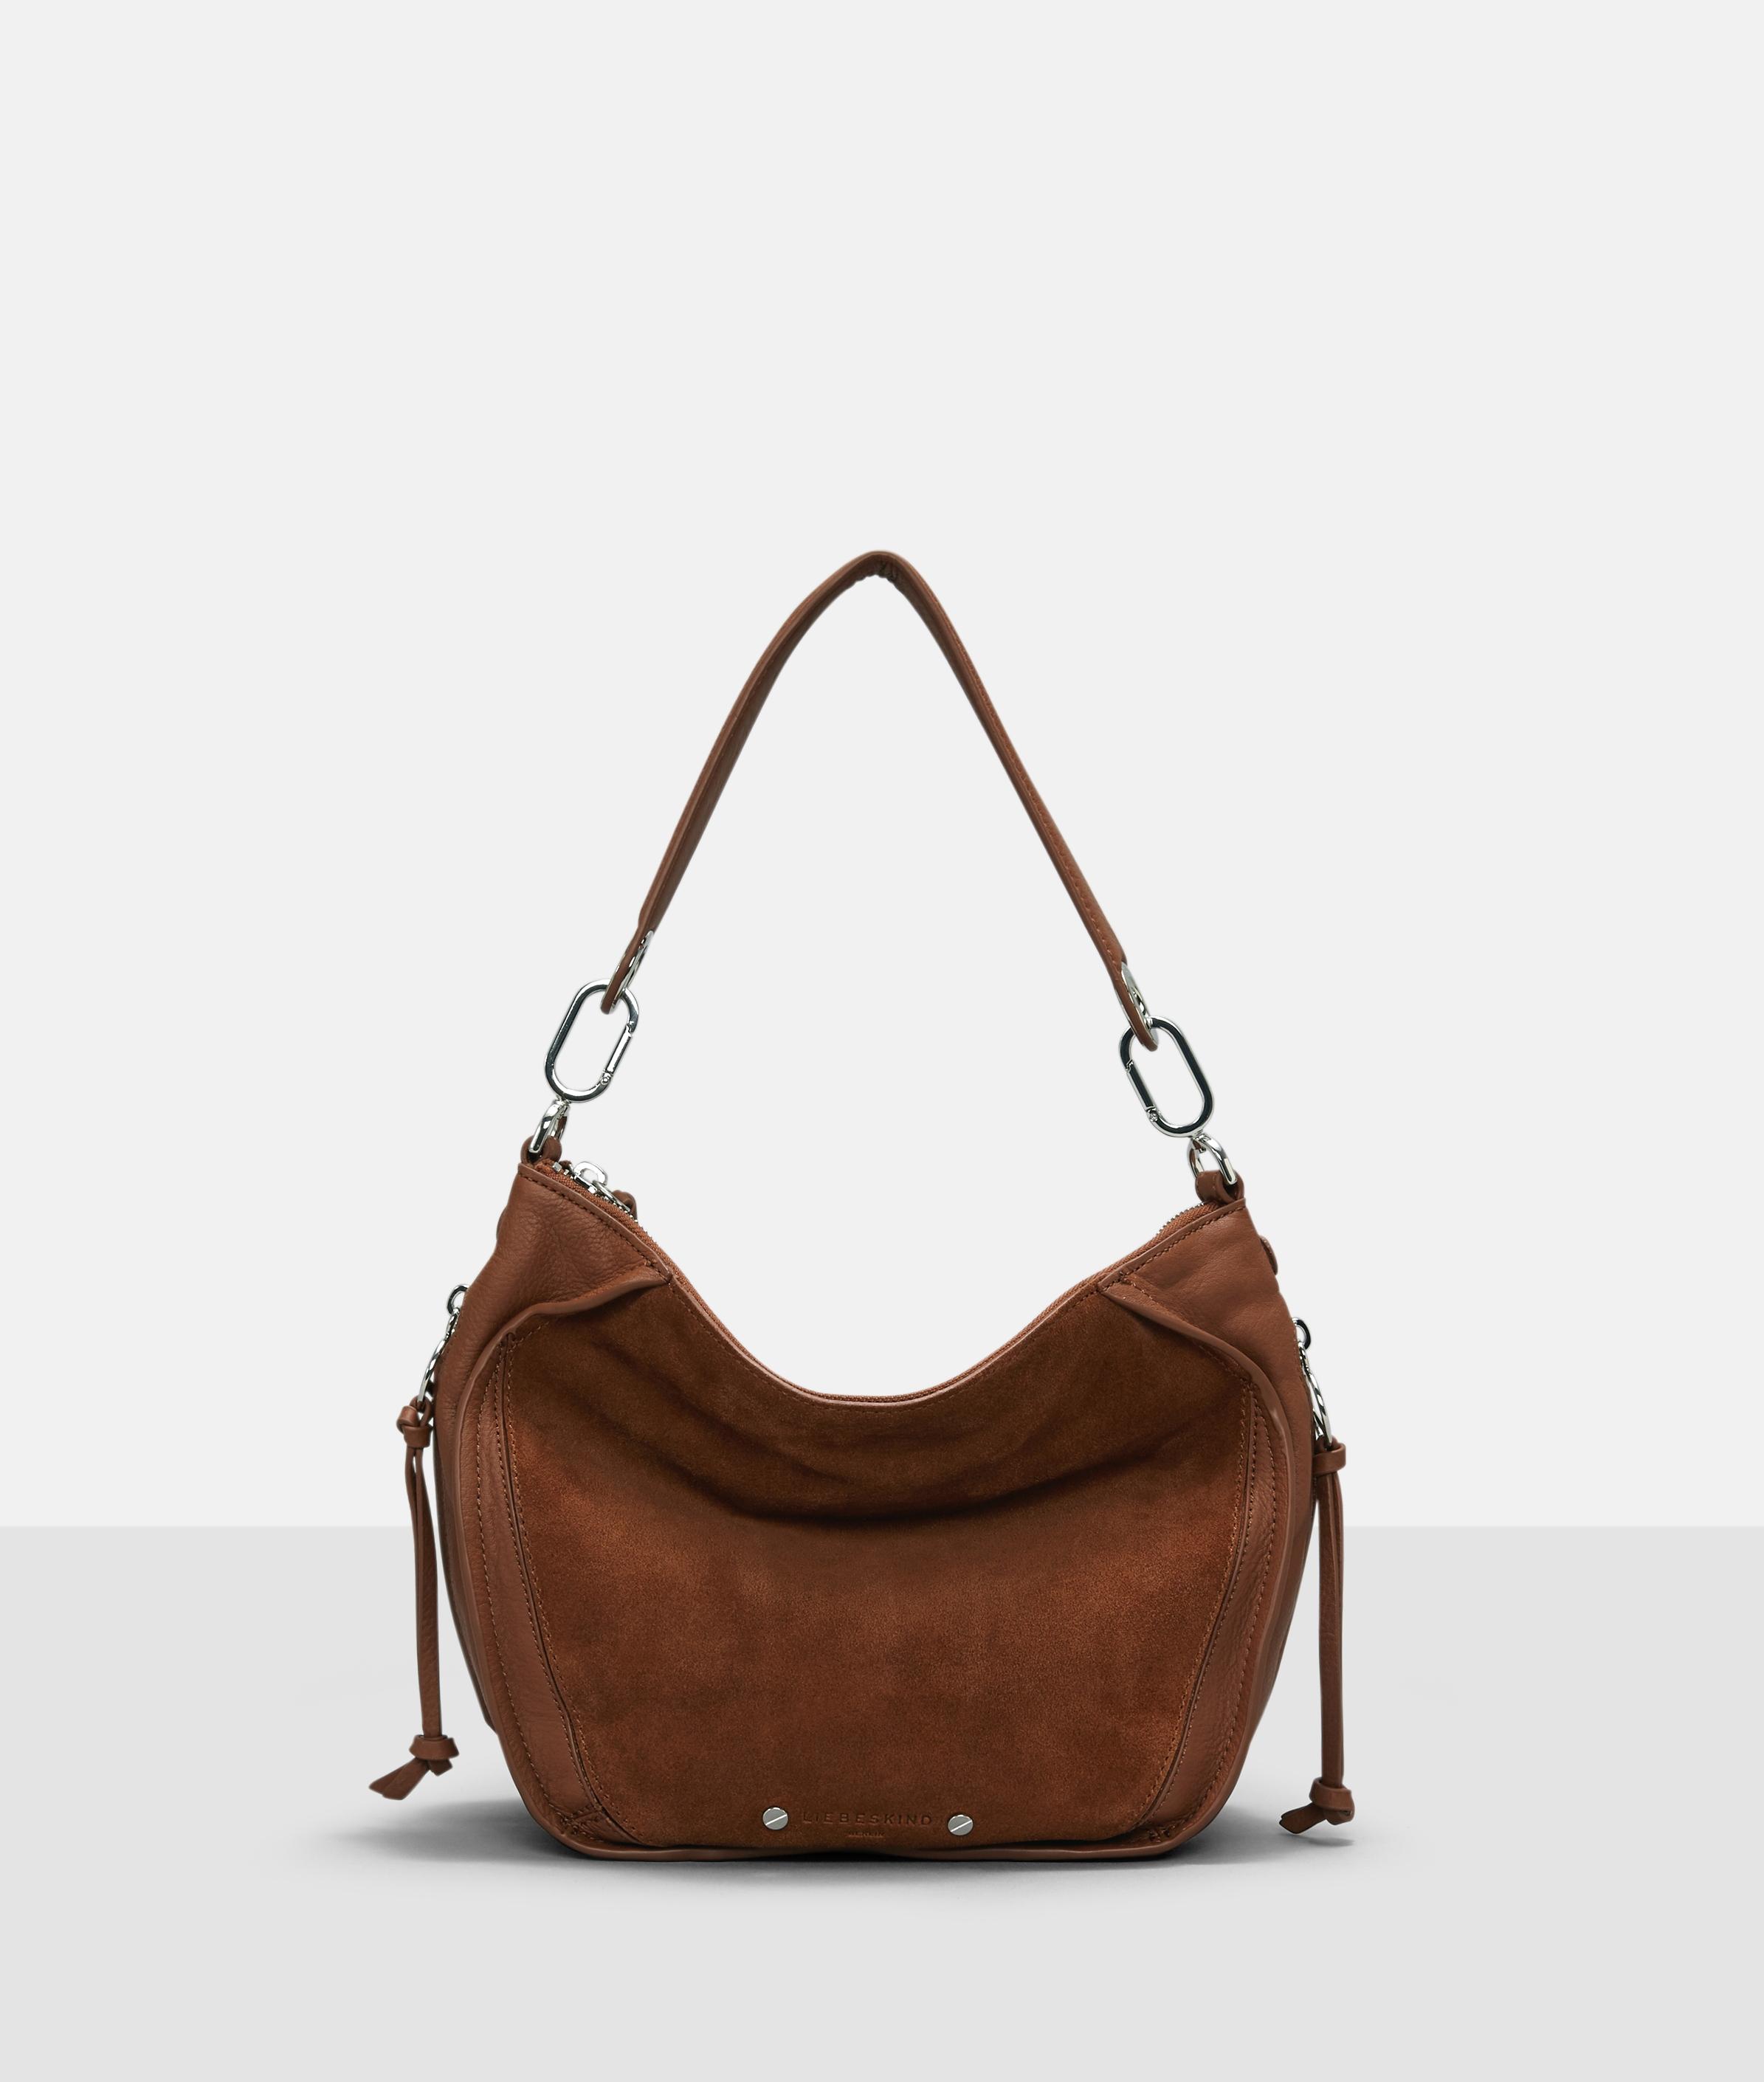 Berlin Tasche Saddy Suede Crossbody Bag S, Braun